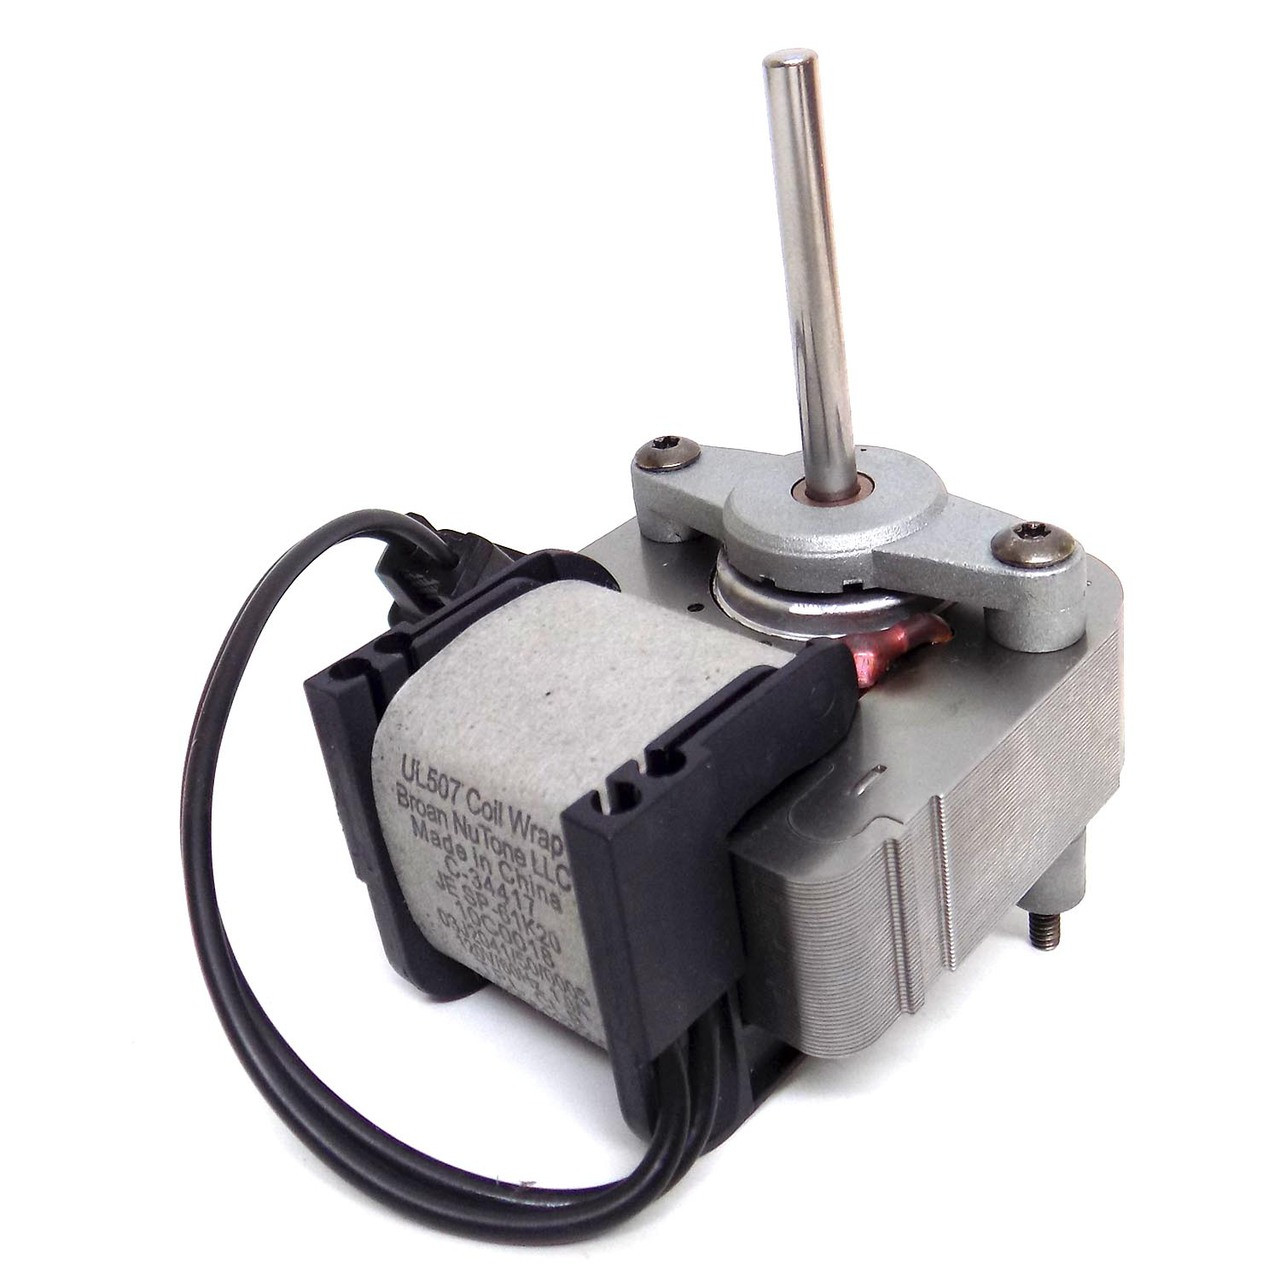 Broan-Nutone 34417 - Replacement Motor